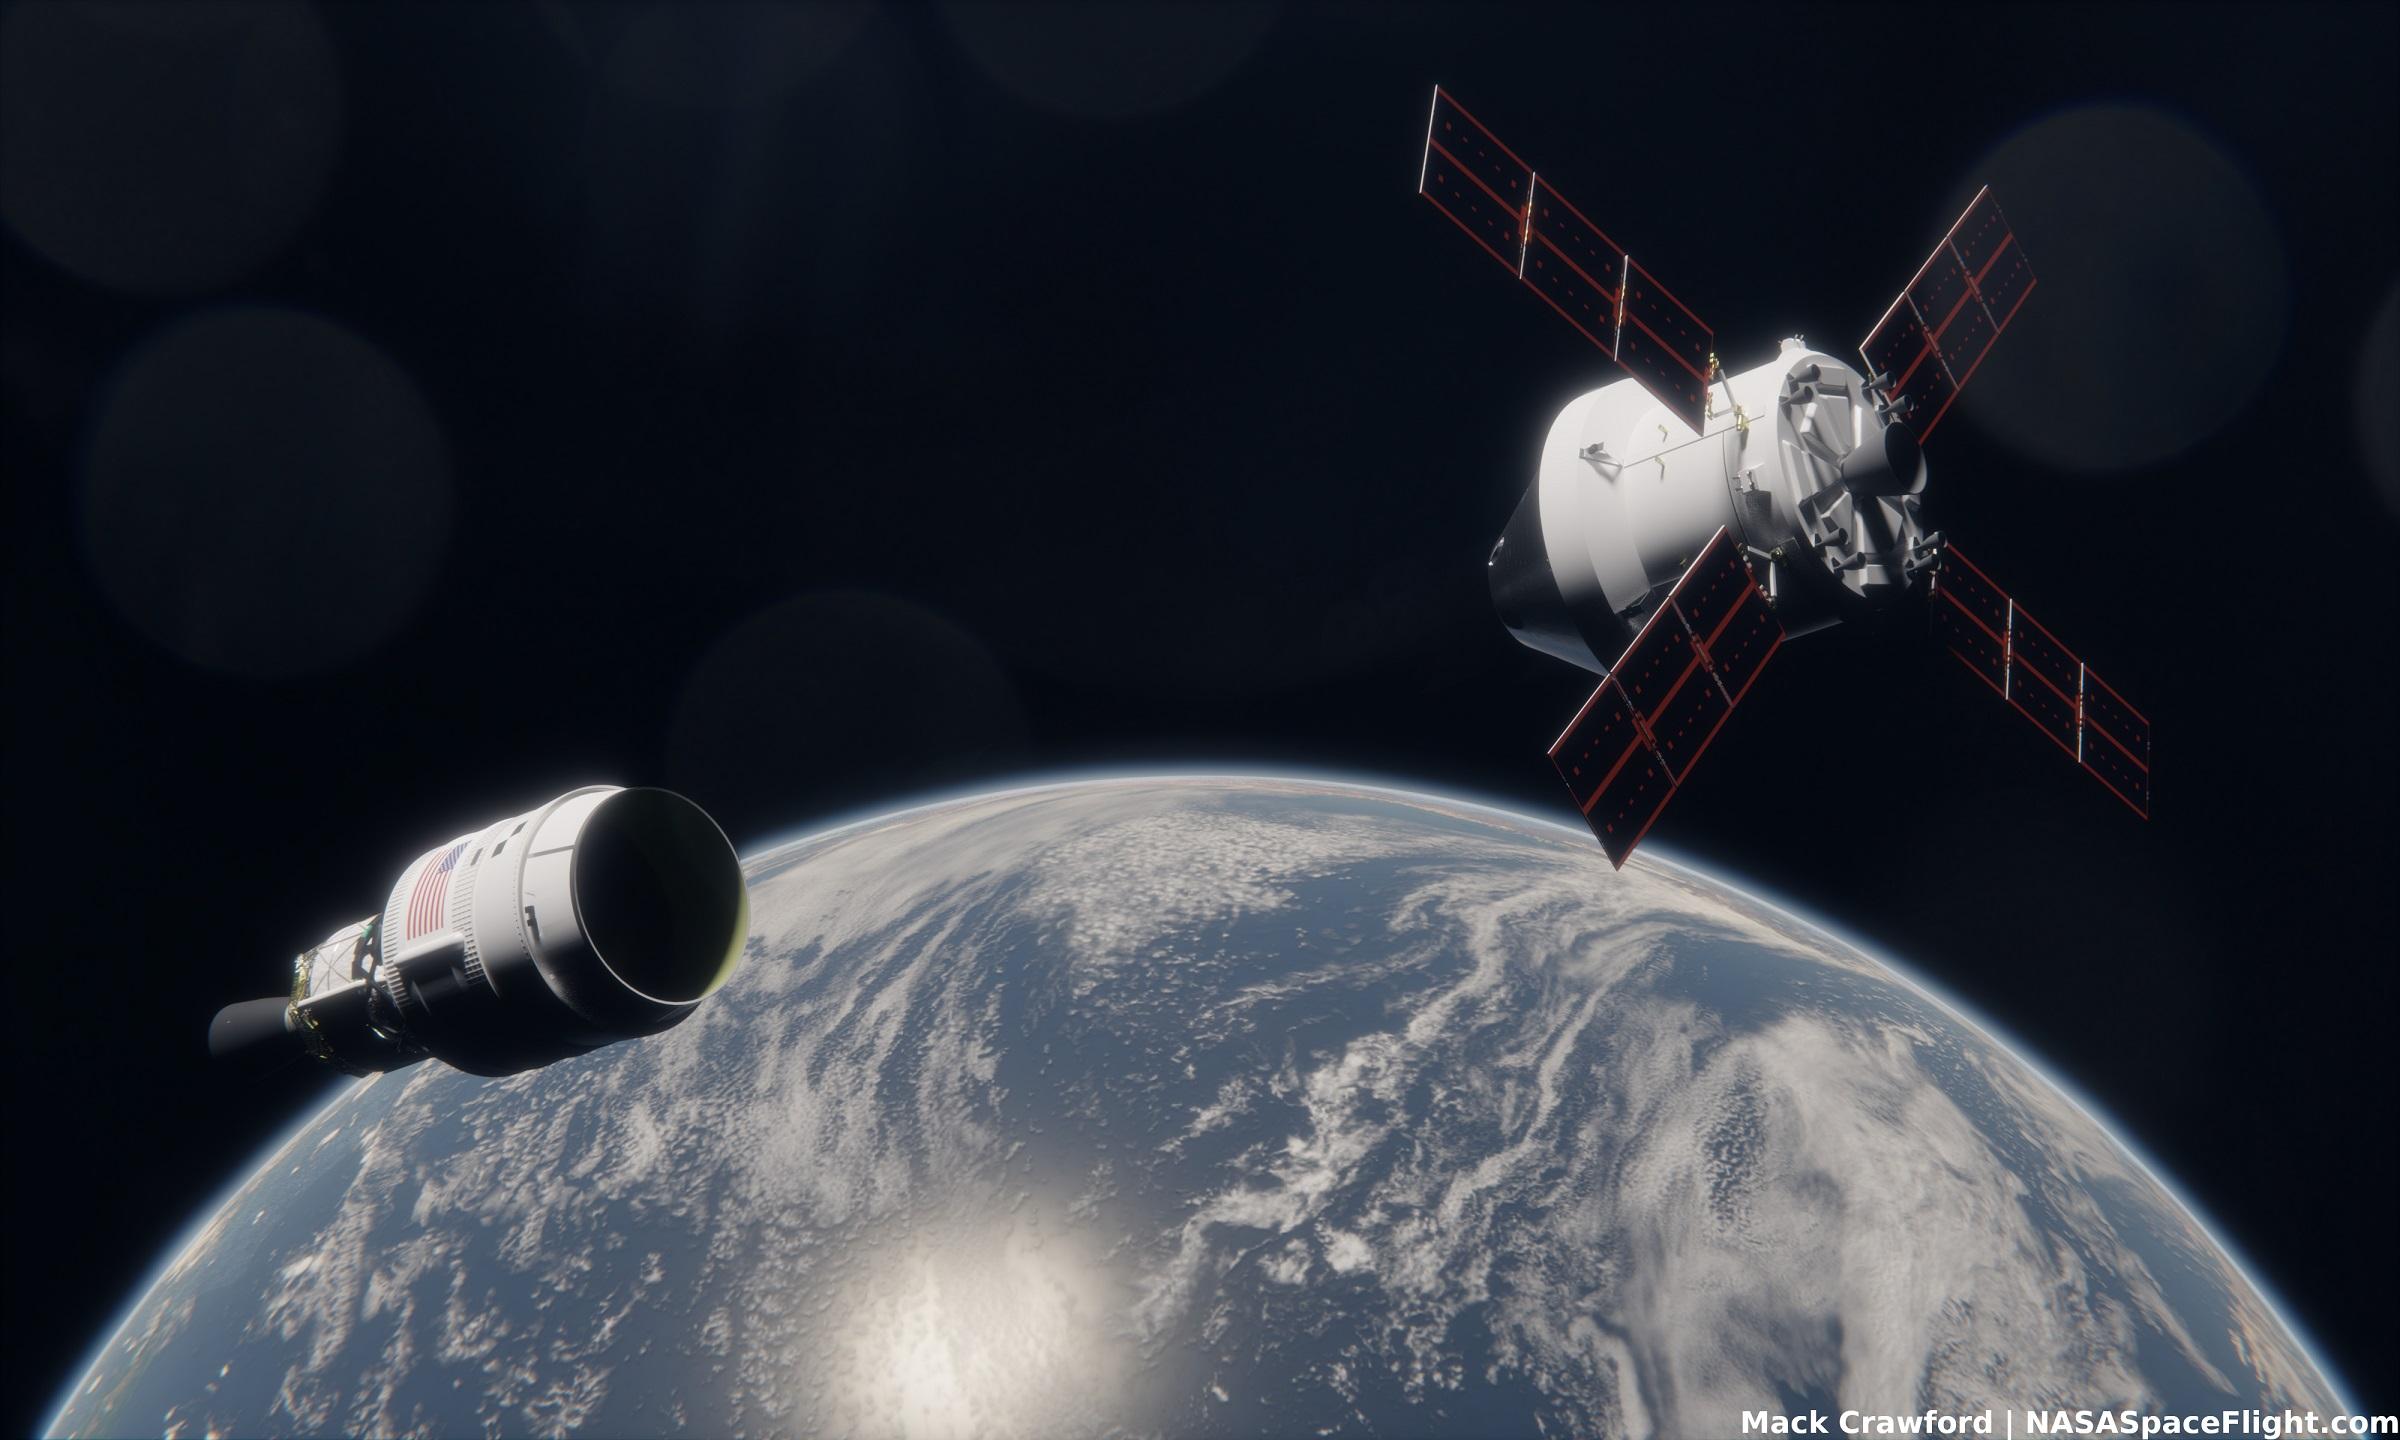 NASA studying practice rendezvous options for Artemis 2 Orion - NASASpaceFlight.com